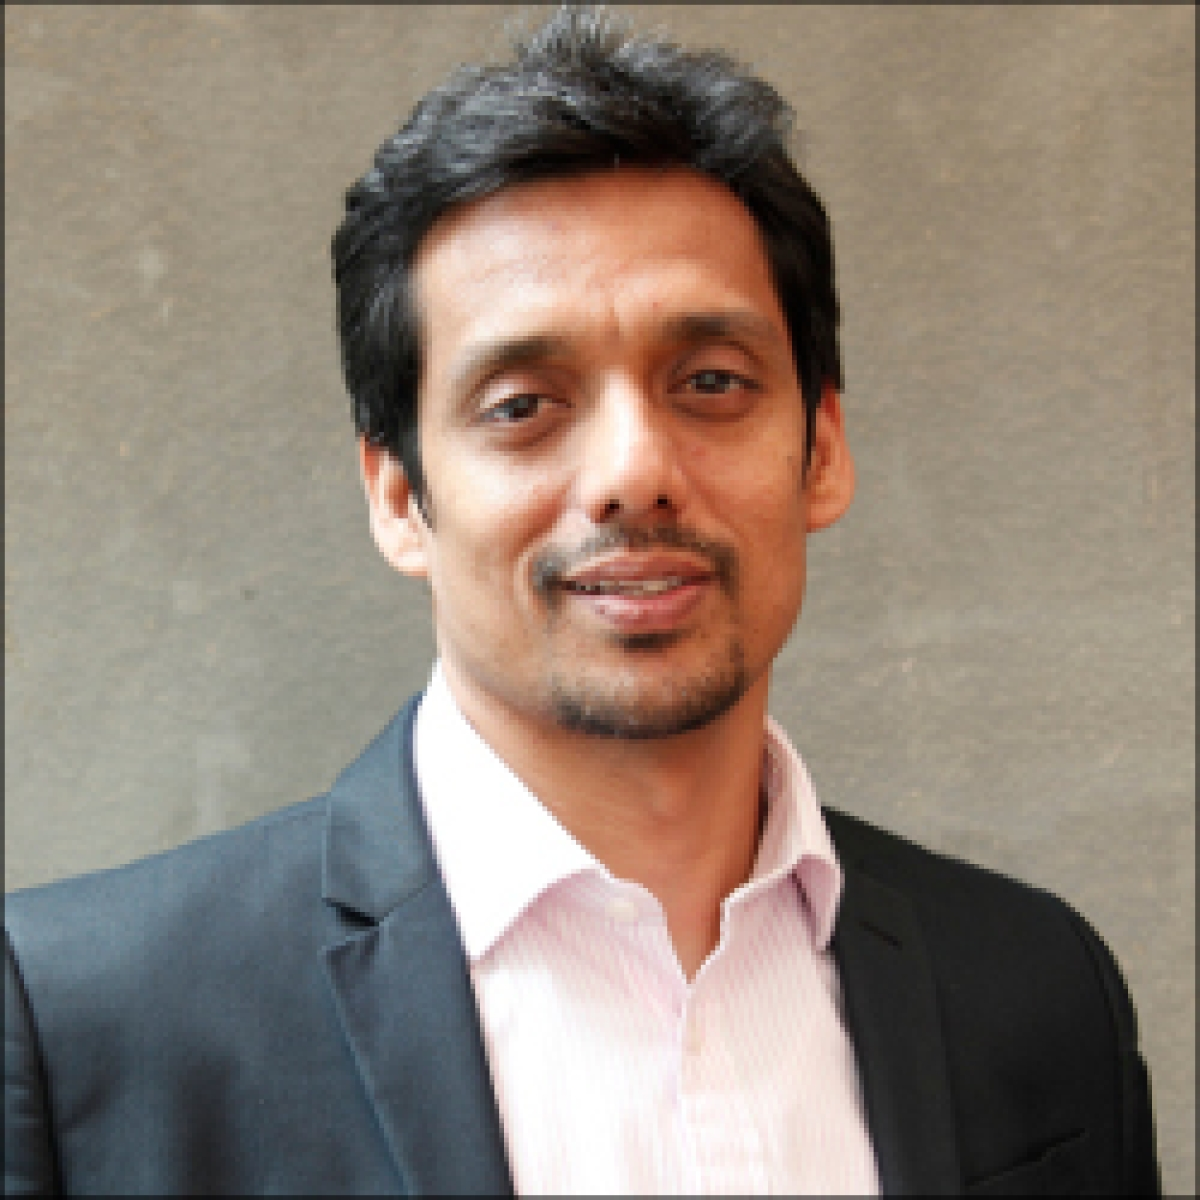 Prasanna Kulkarni joins Indigo Consulting as head of creative